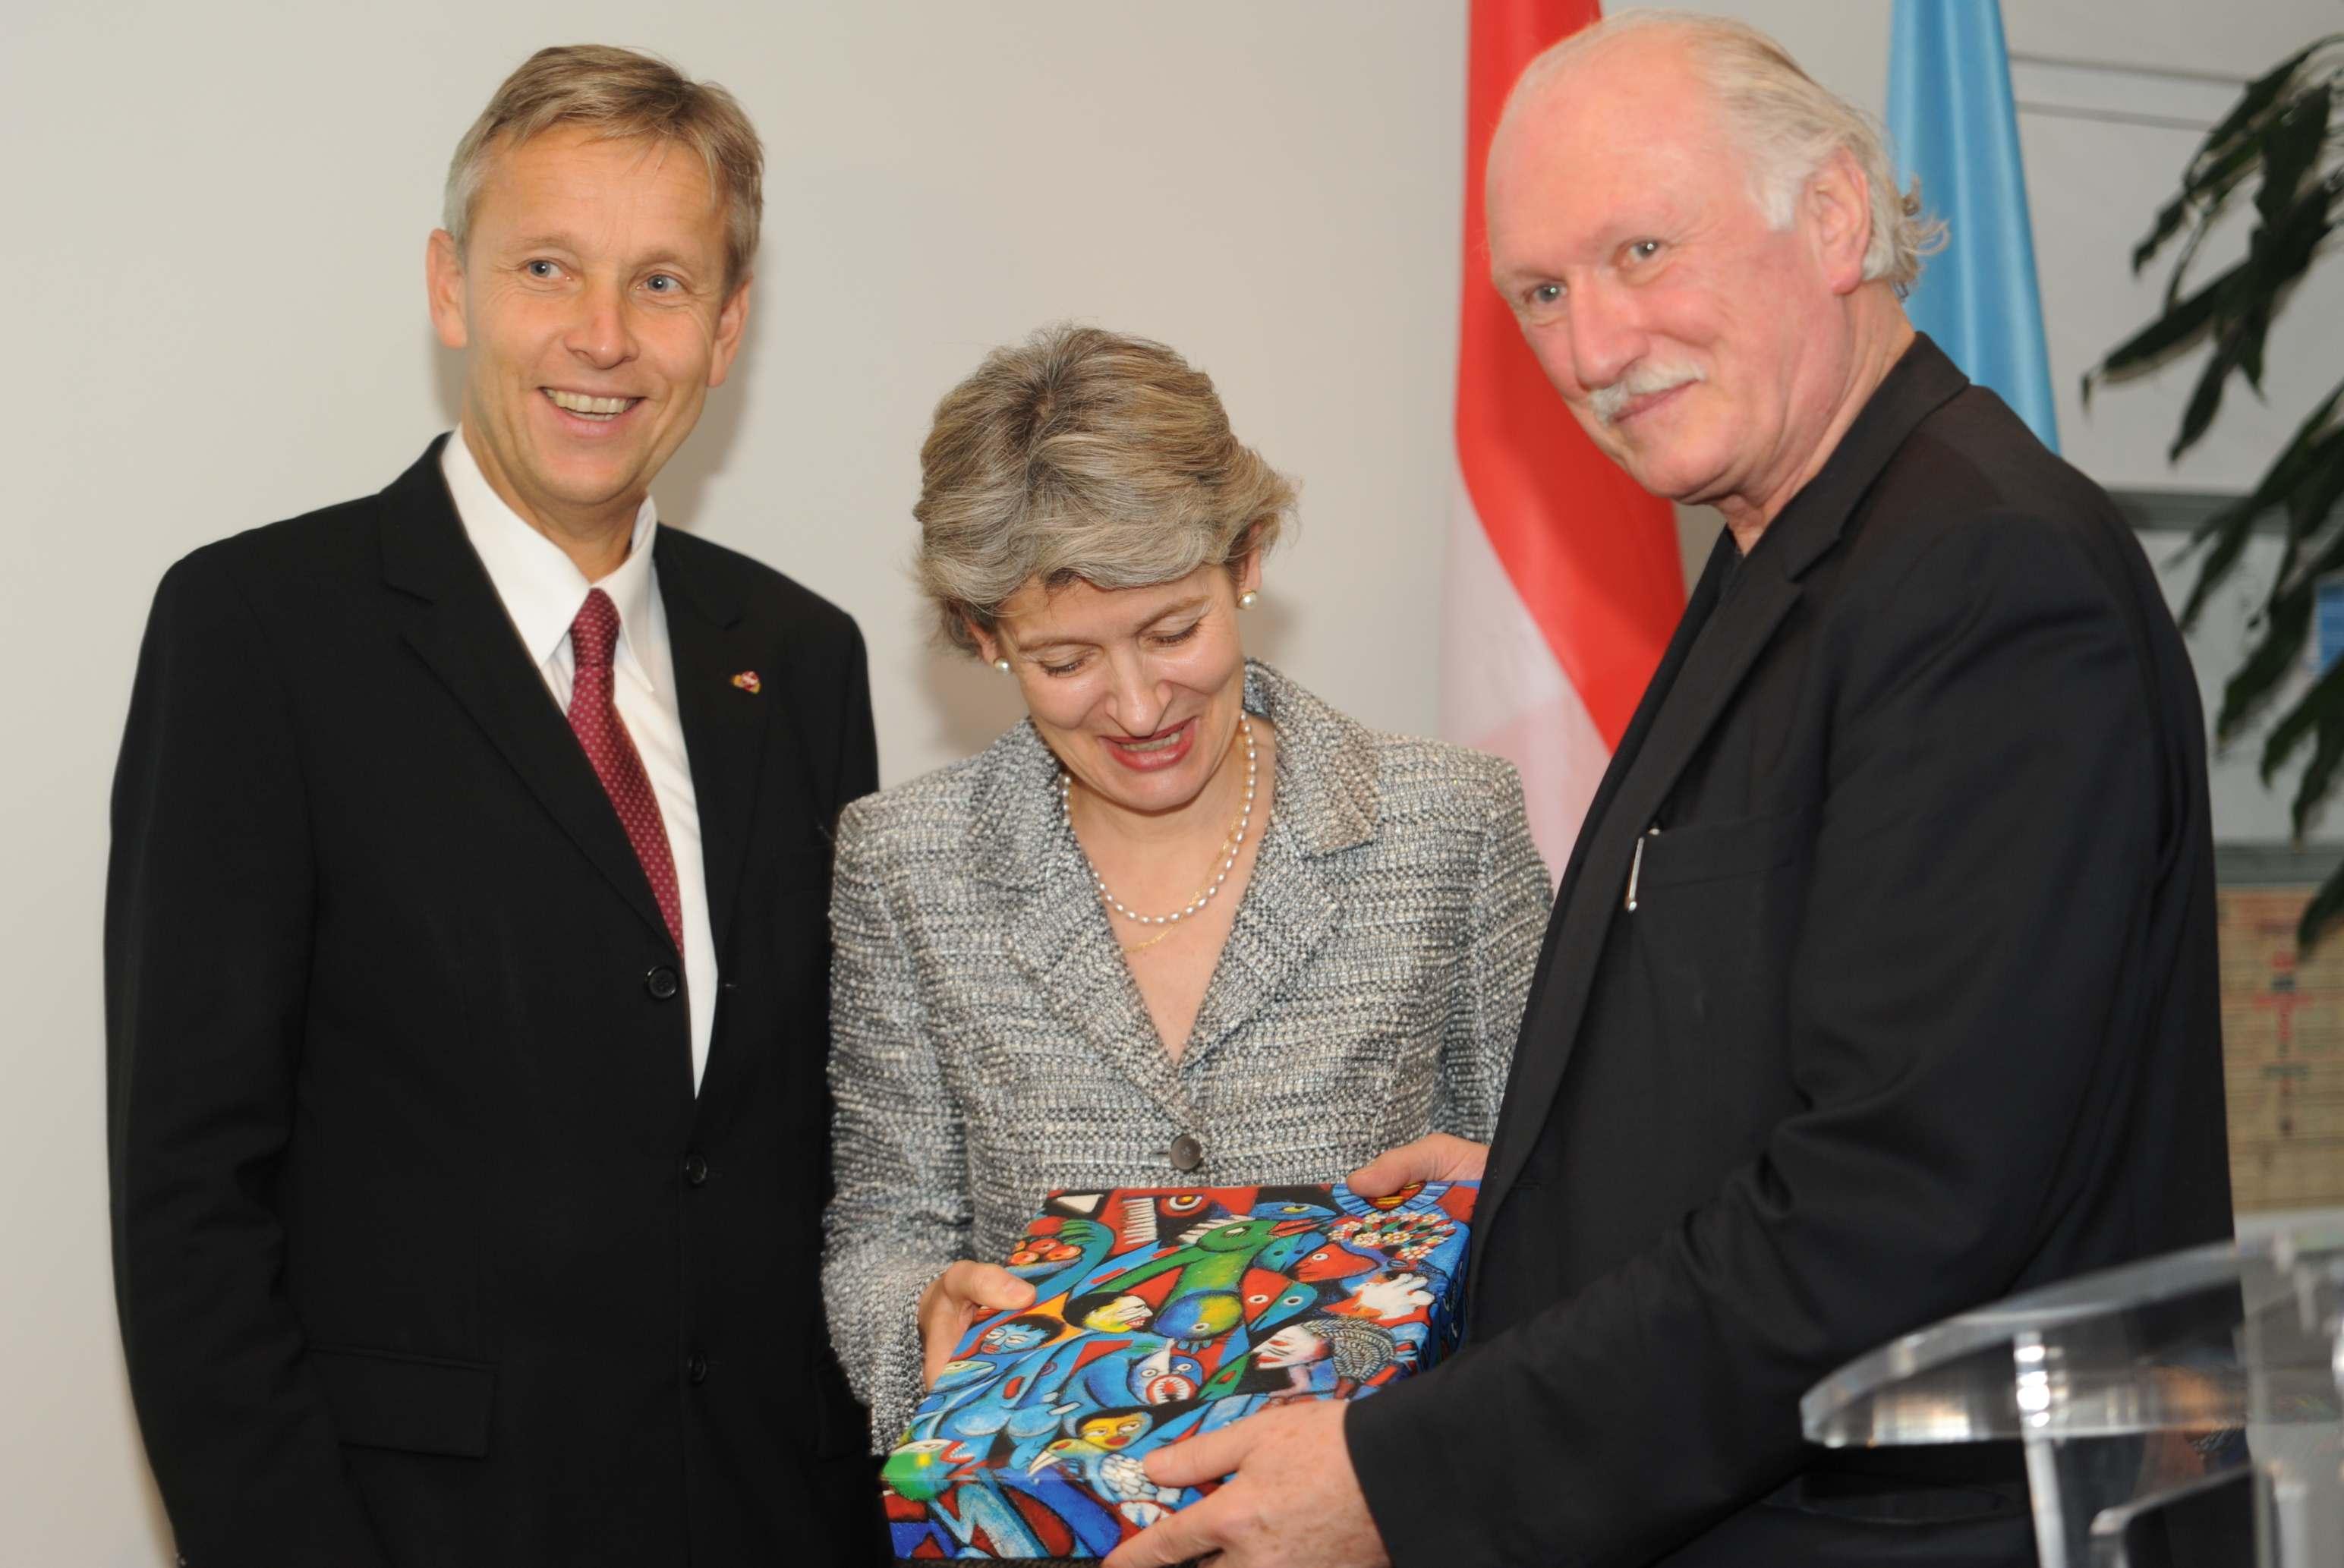 (c) BMEIA, STS Lopatka mit Irina Bokova (Generaldirektorin UNESCO) udn Lois Lammerhuber (Künstler, Fotograph)